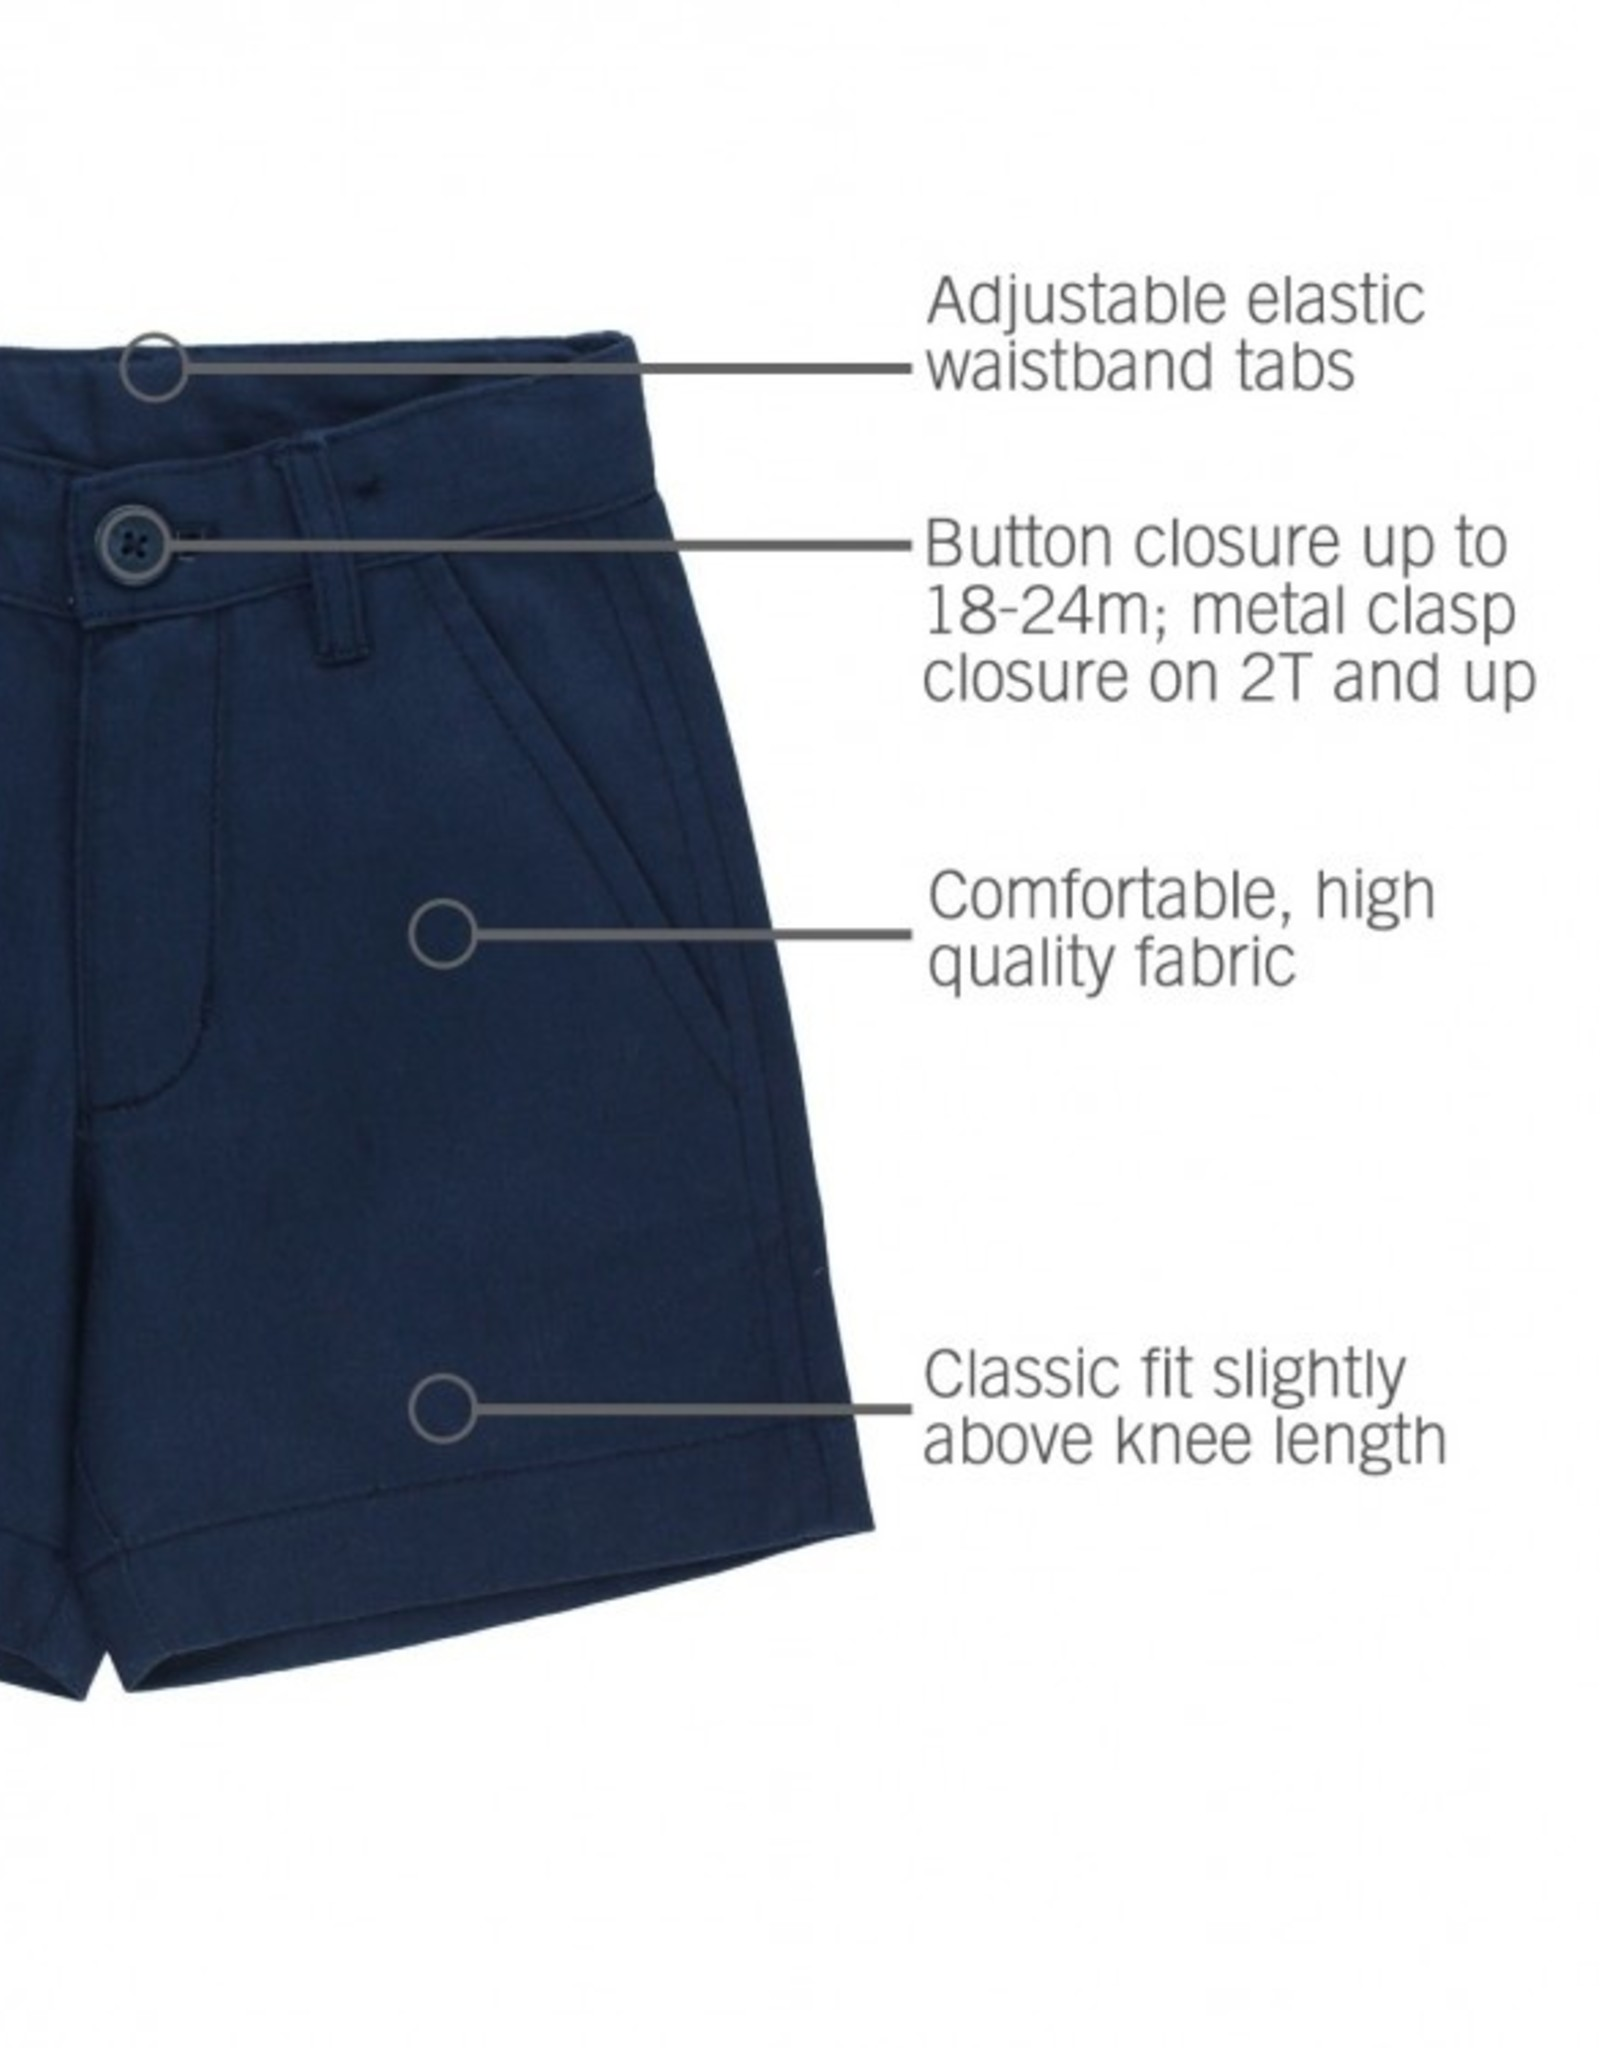 RuggedButts Navy Lightweight Chino Shorts 2T